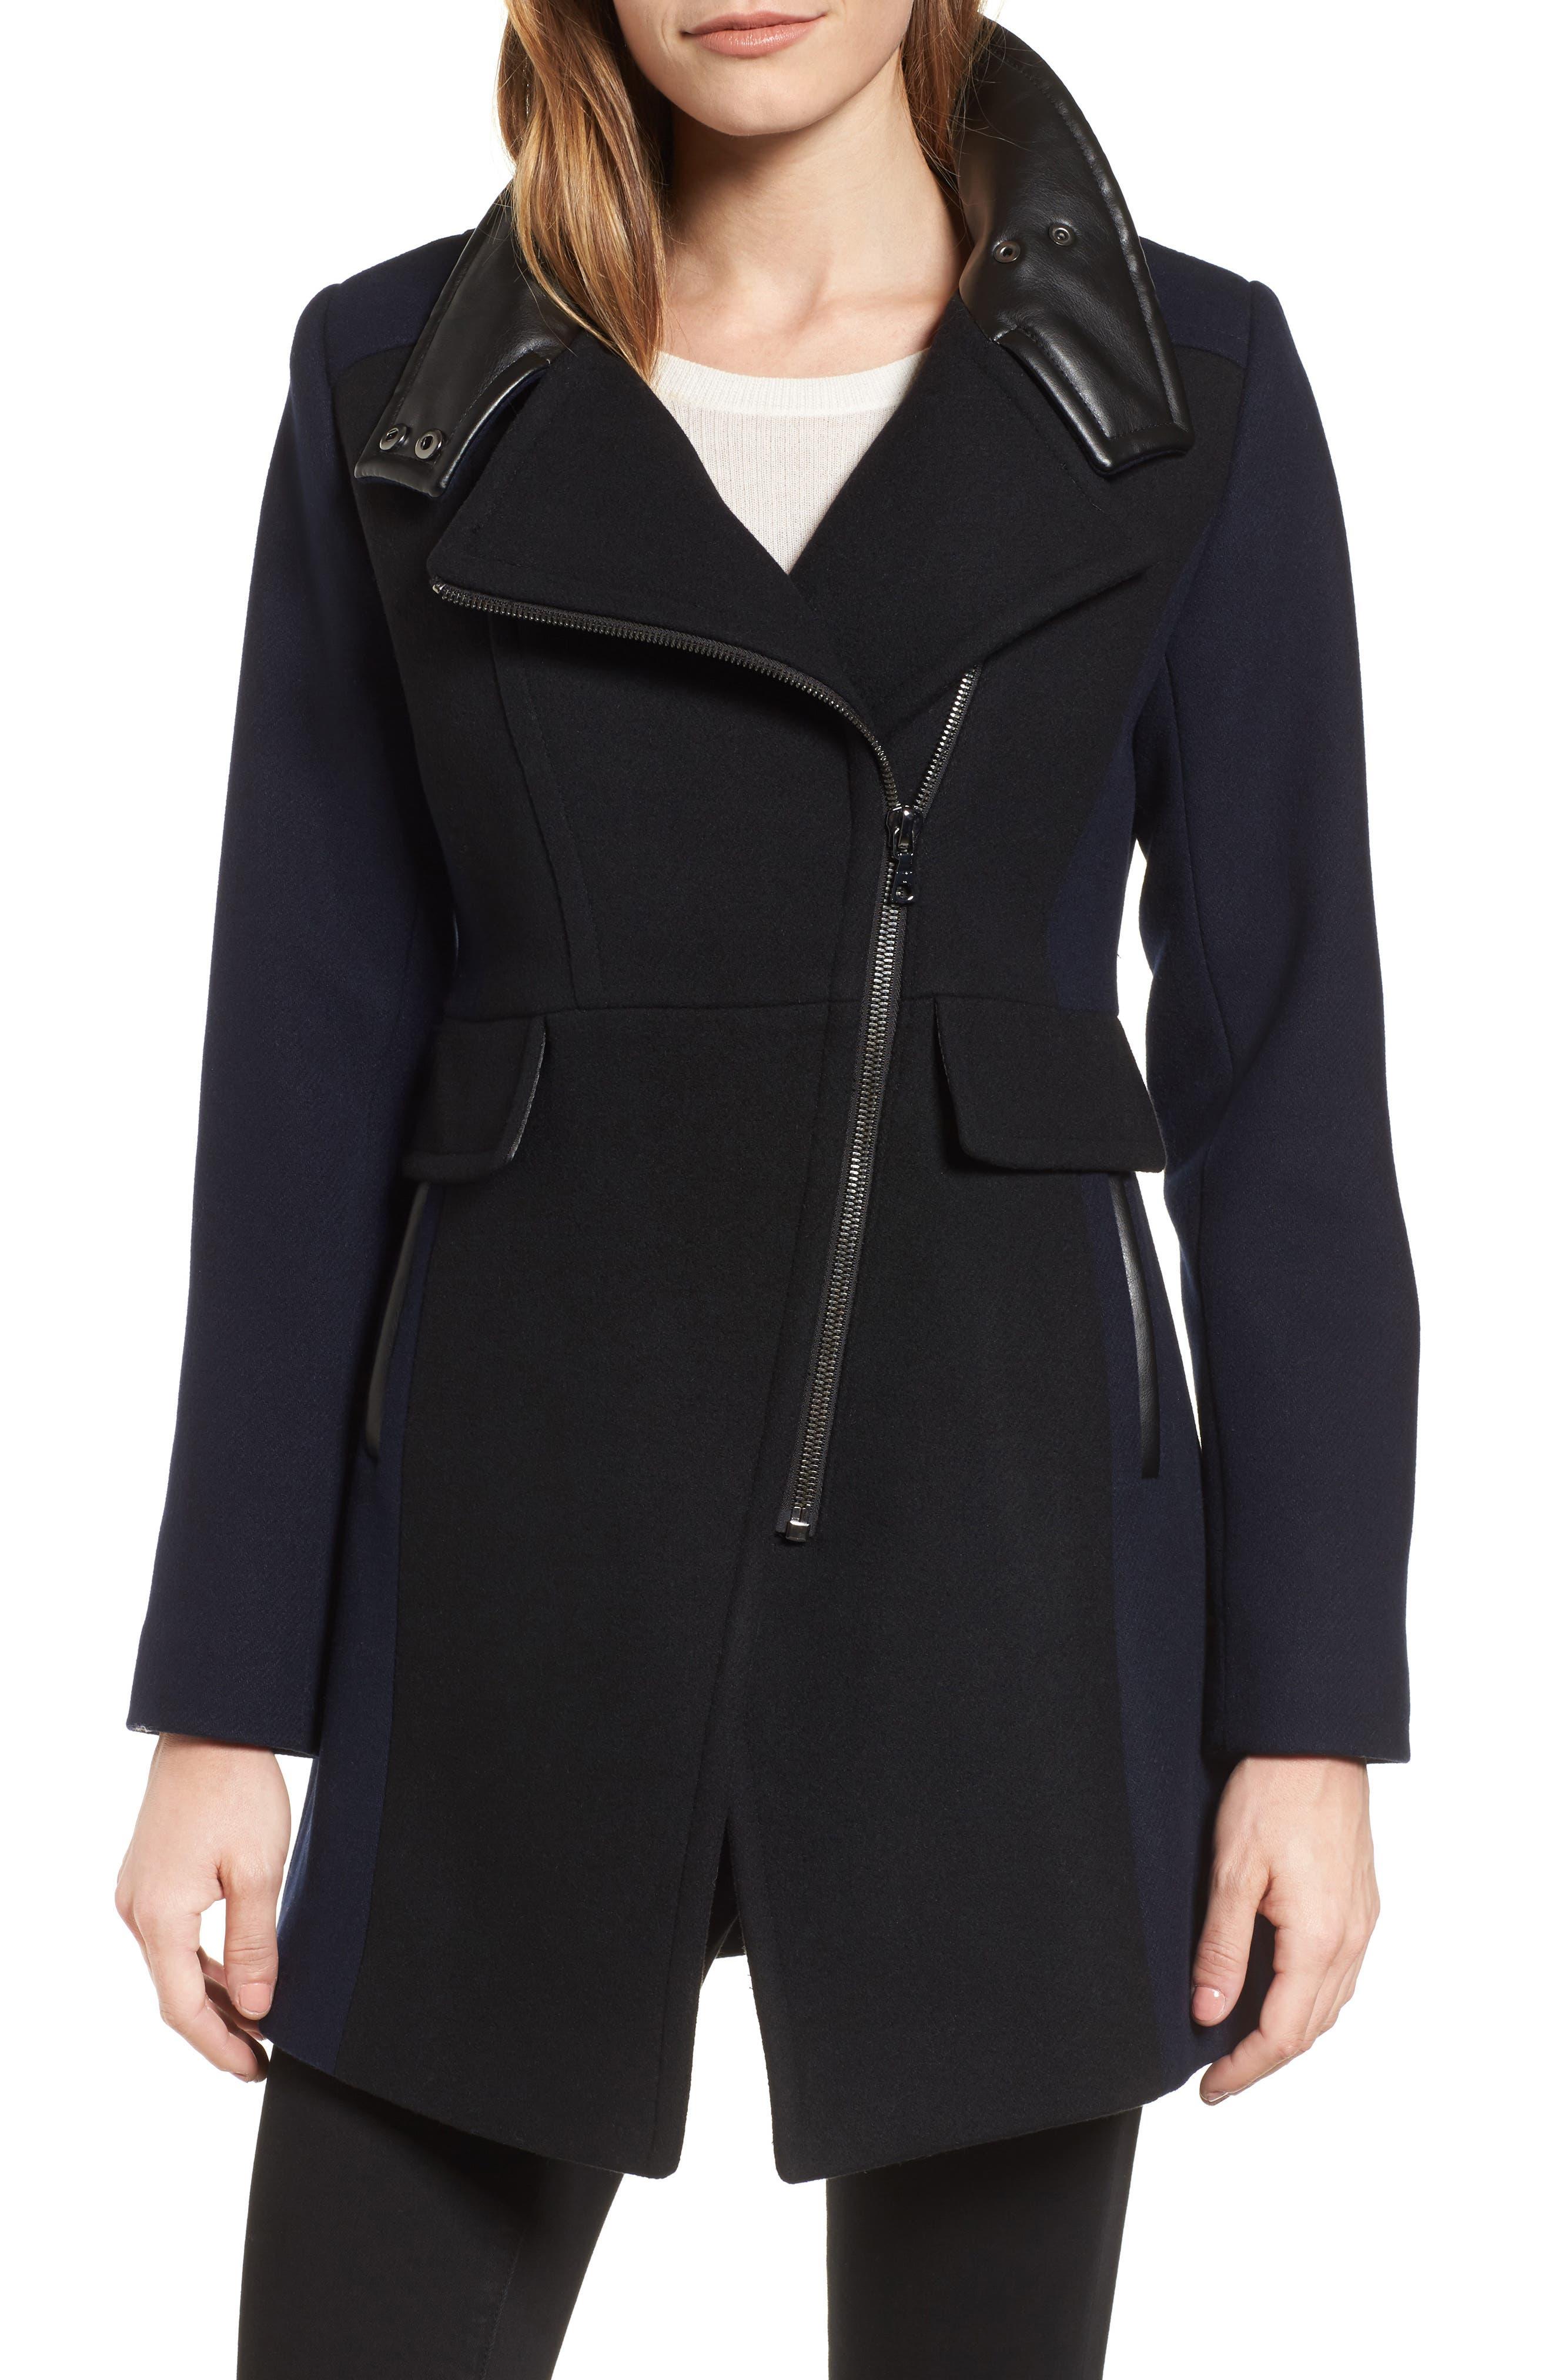 Eleanor Leather Trim Wool Blend Coat,                         Main,                         color, 002